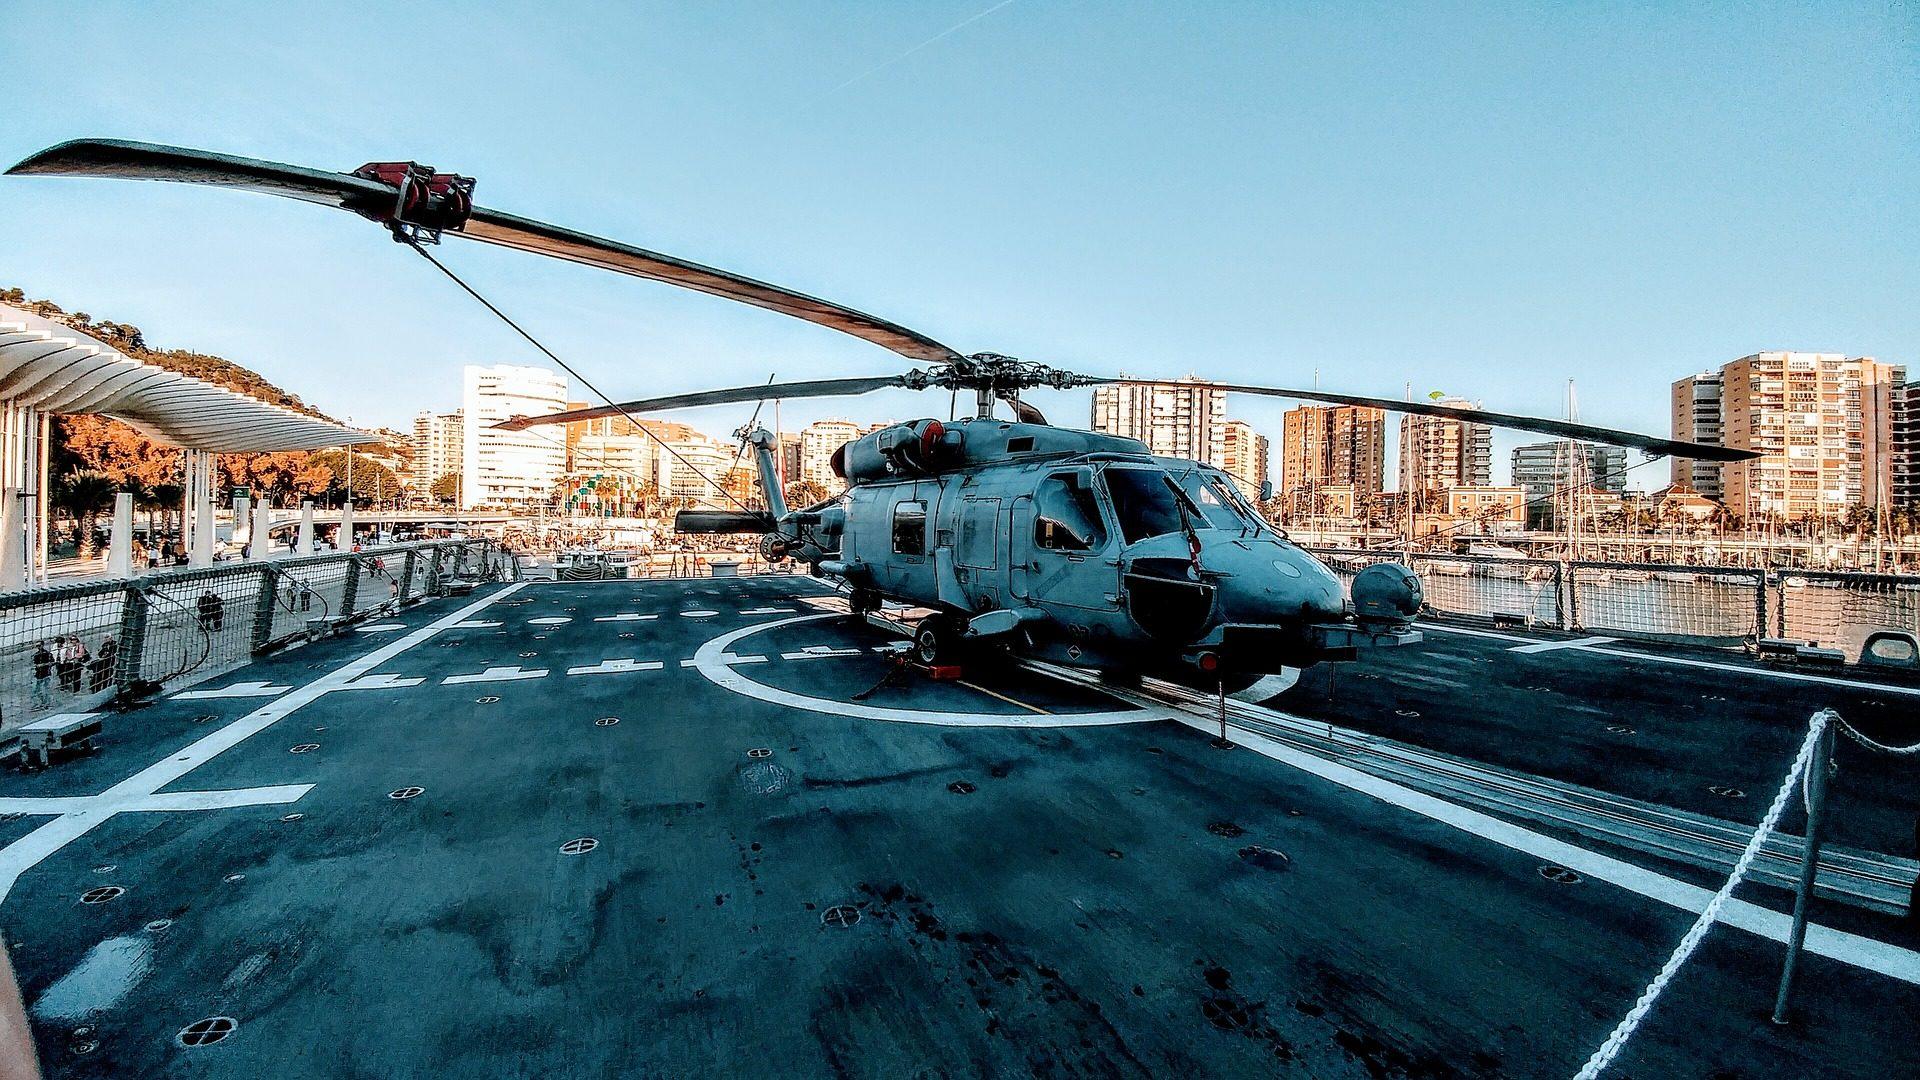 helicóptero, militar, SH-60b, Seahawk, faixa, voo - Papéis de parede HD - Professor-falken.com